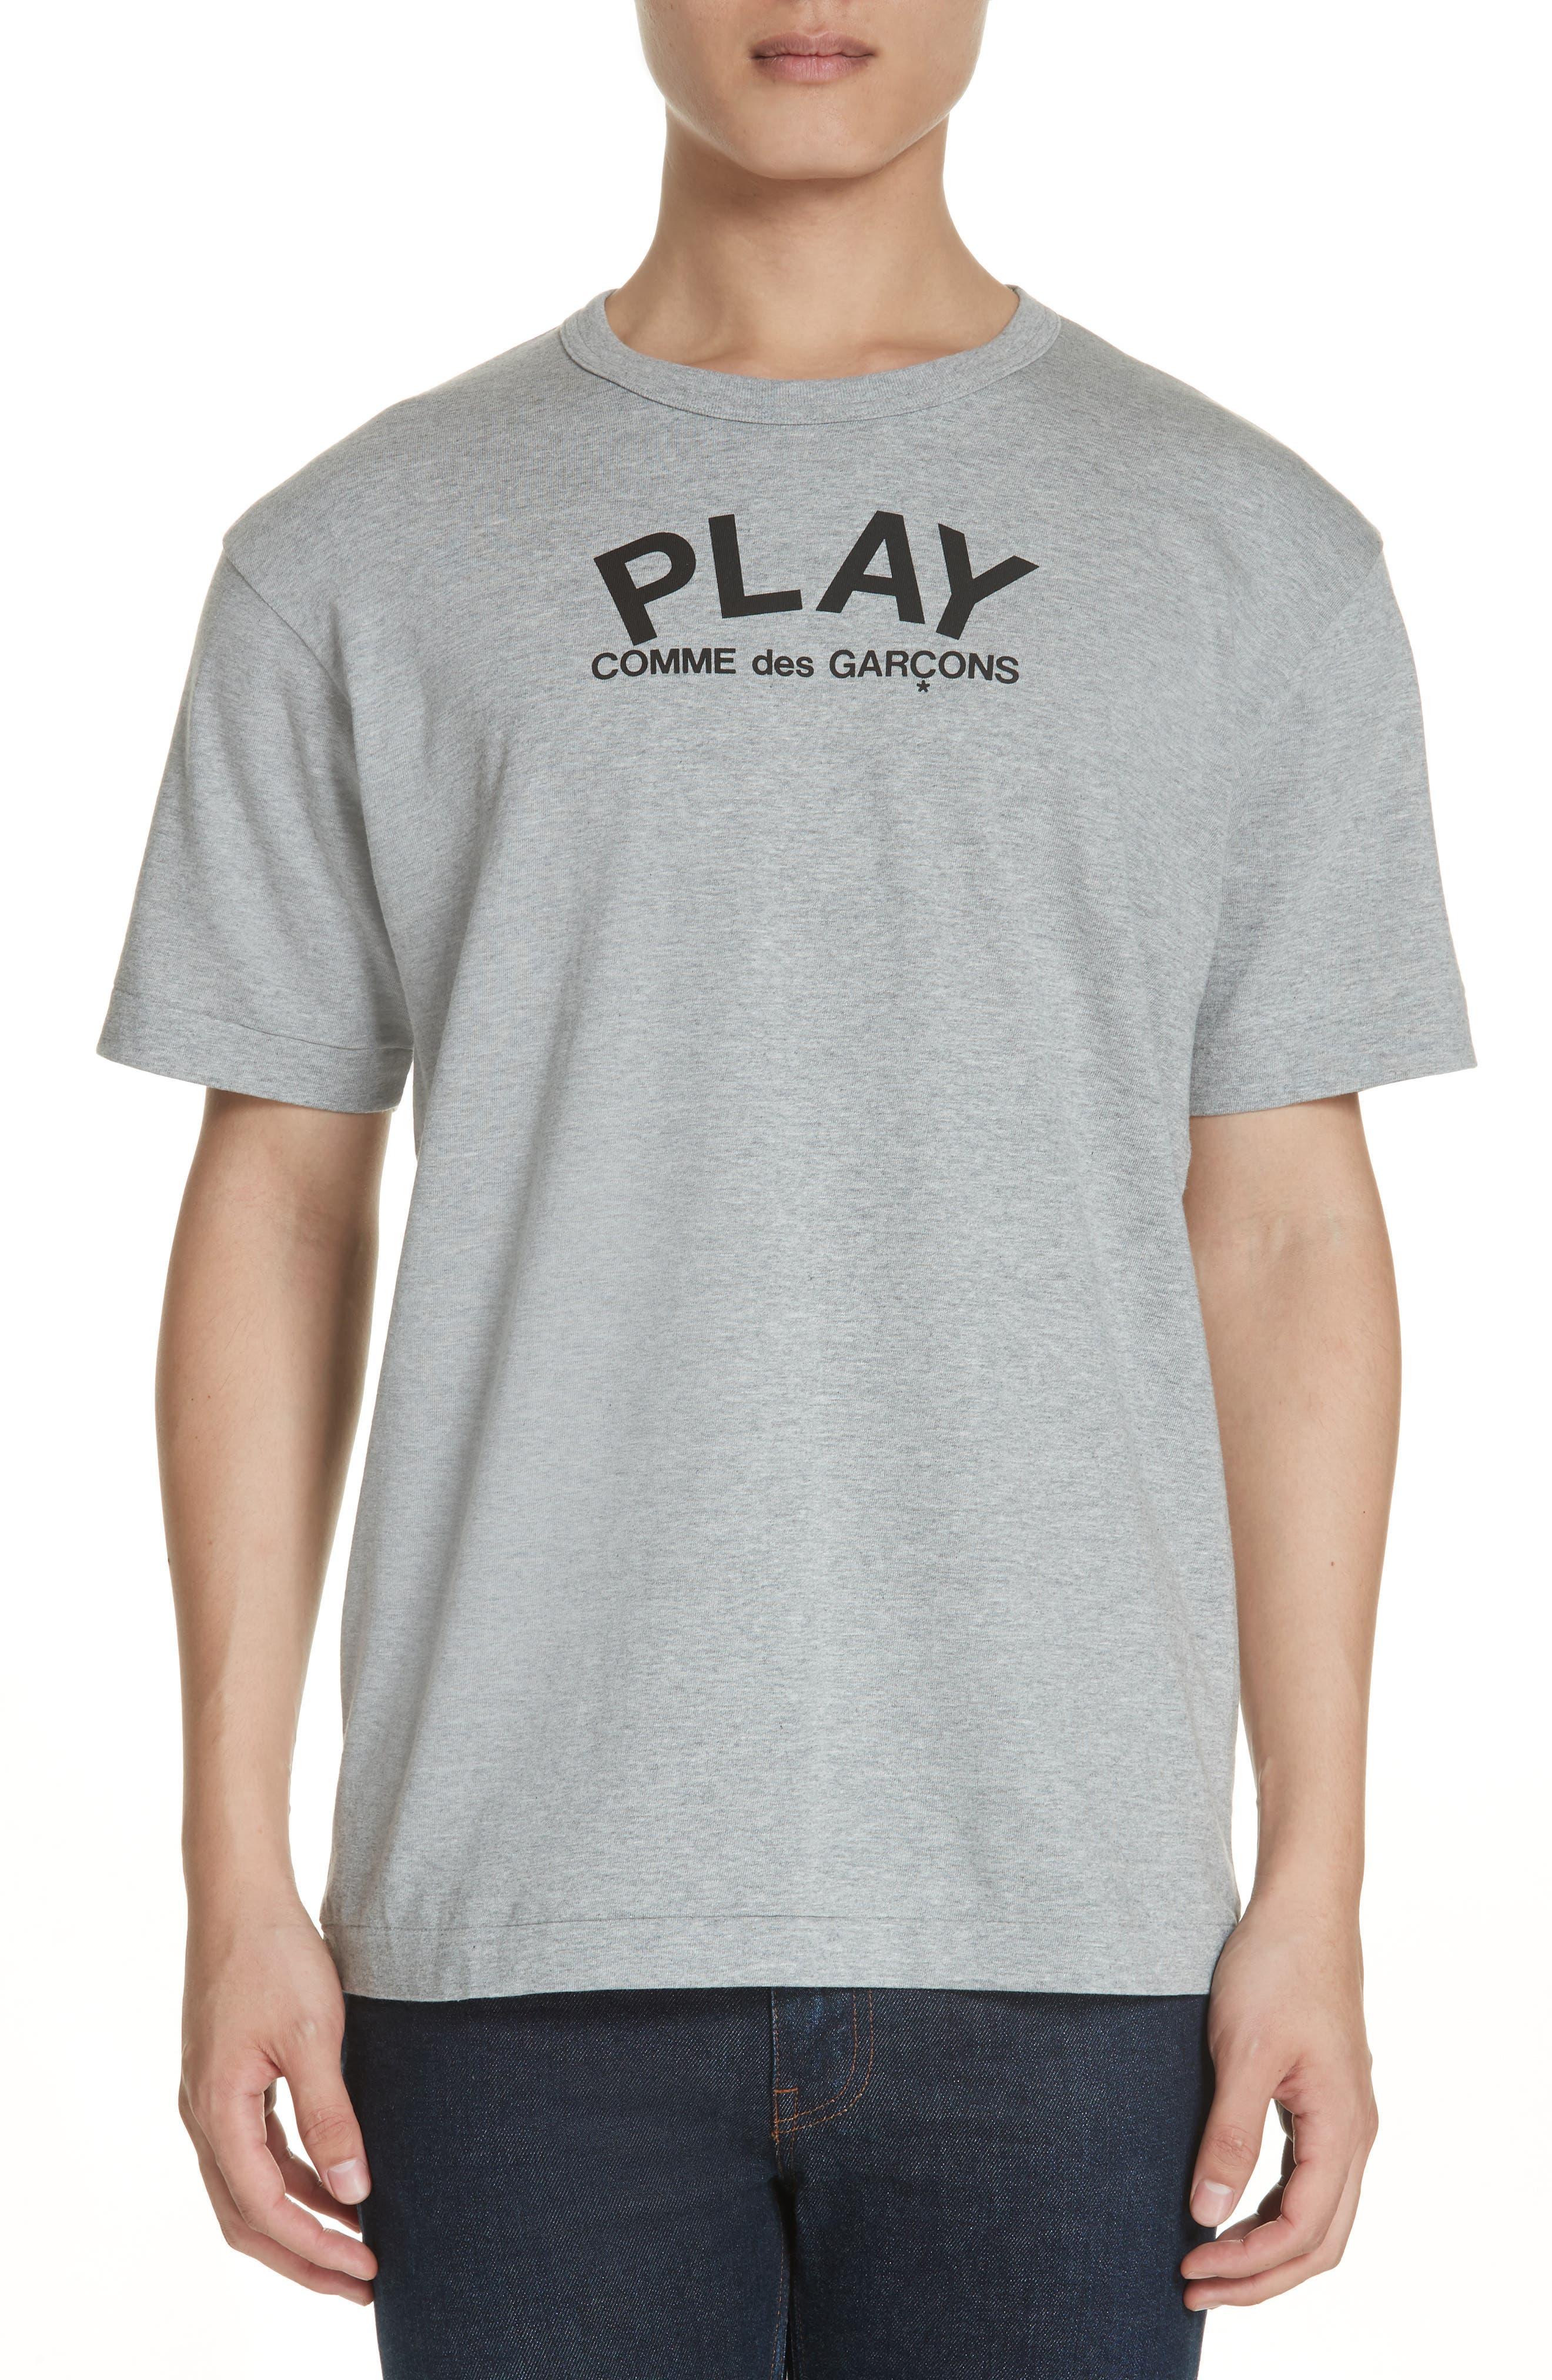 COMME DES GARÇONS PLAY Logo T-Shirt, Main, color, GREY